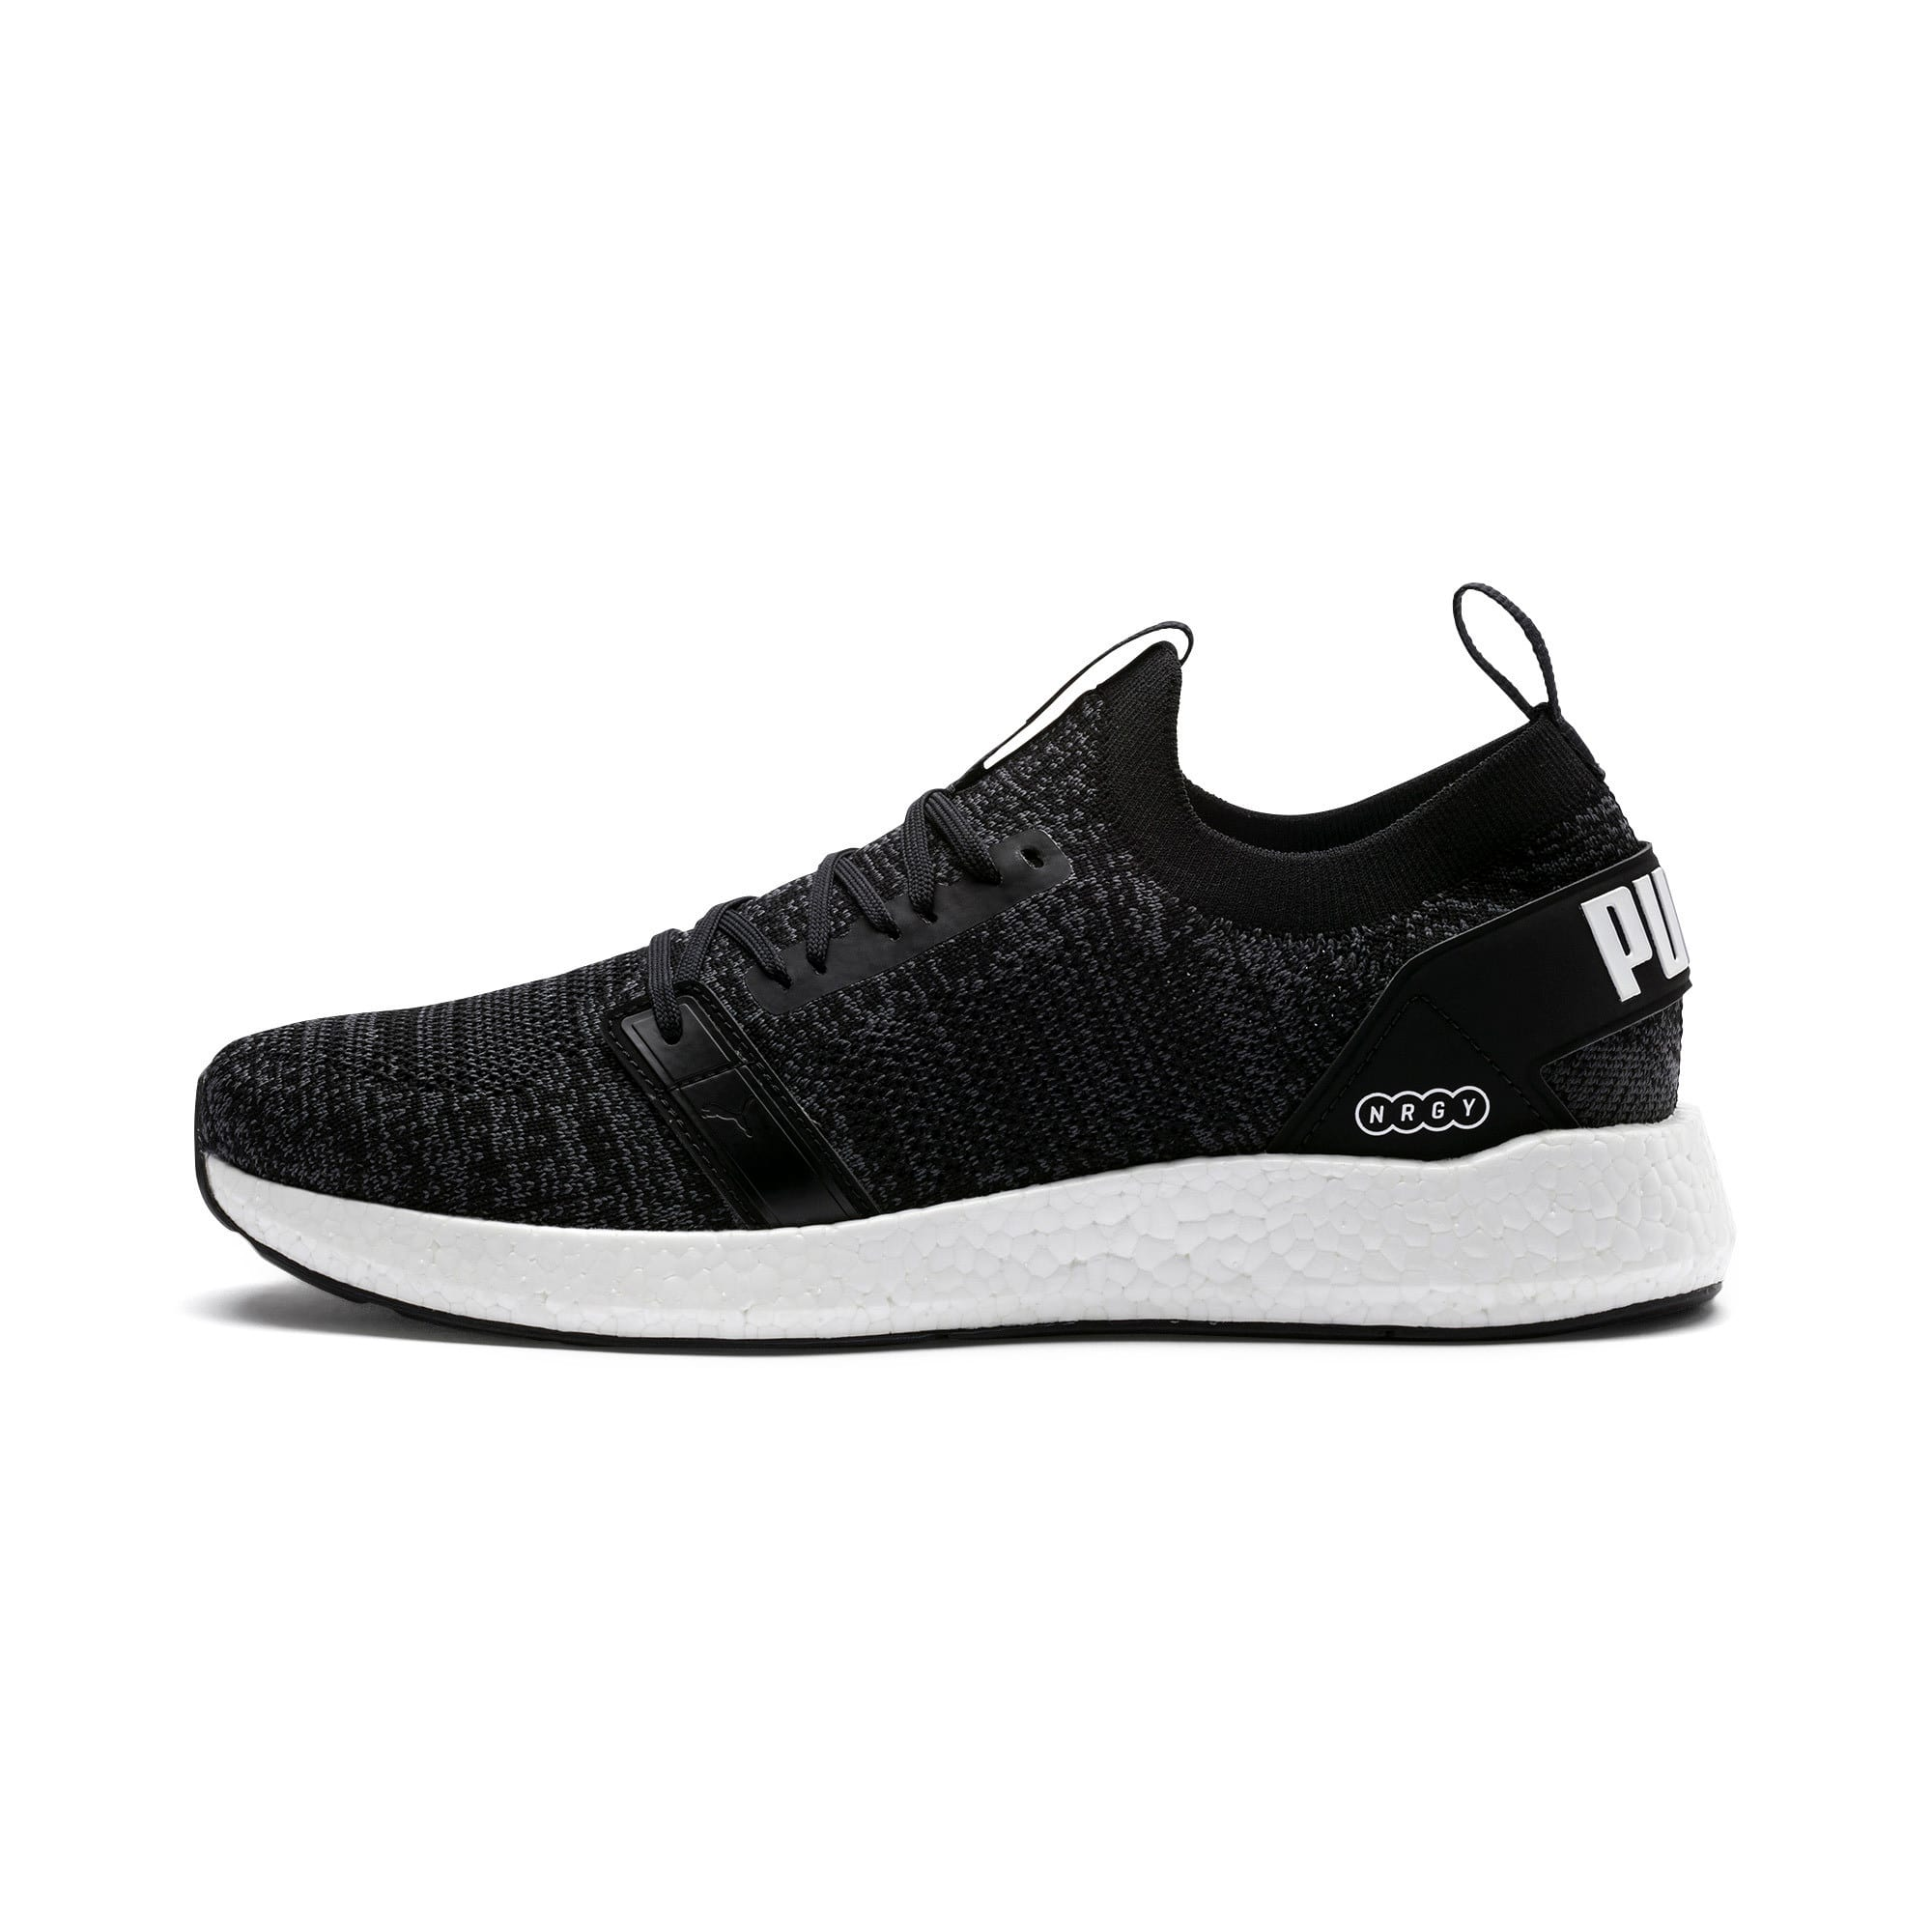 Thumbnail 1 of NRGY Neko Engineer Knit Men's Running Shoes, Puma Black-Iron Gate, medium